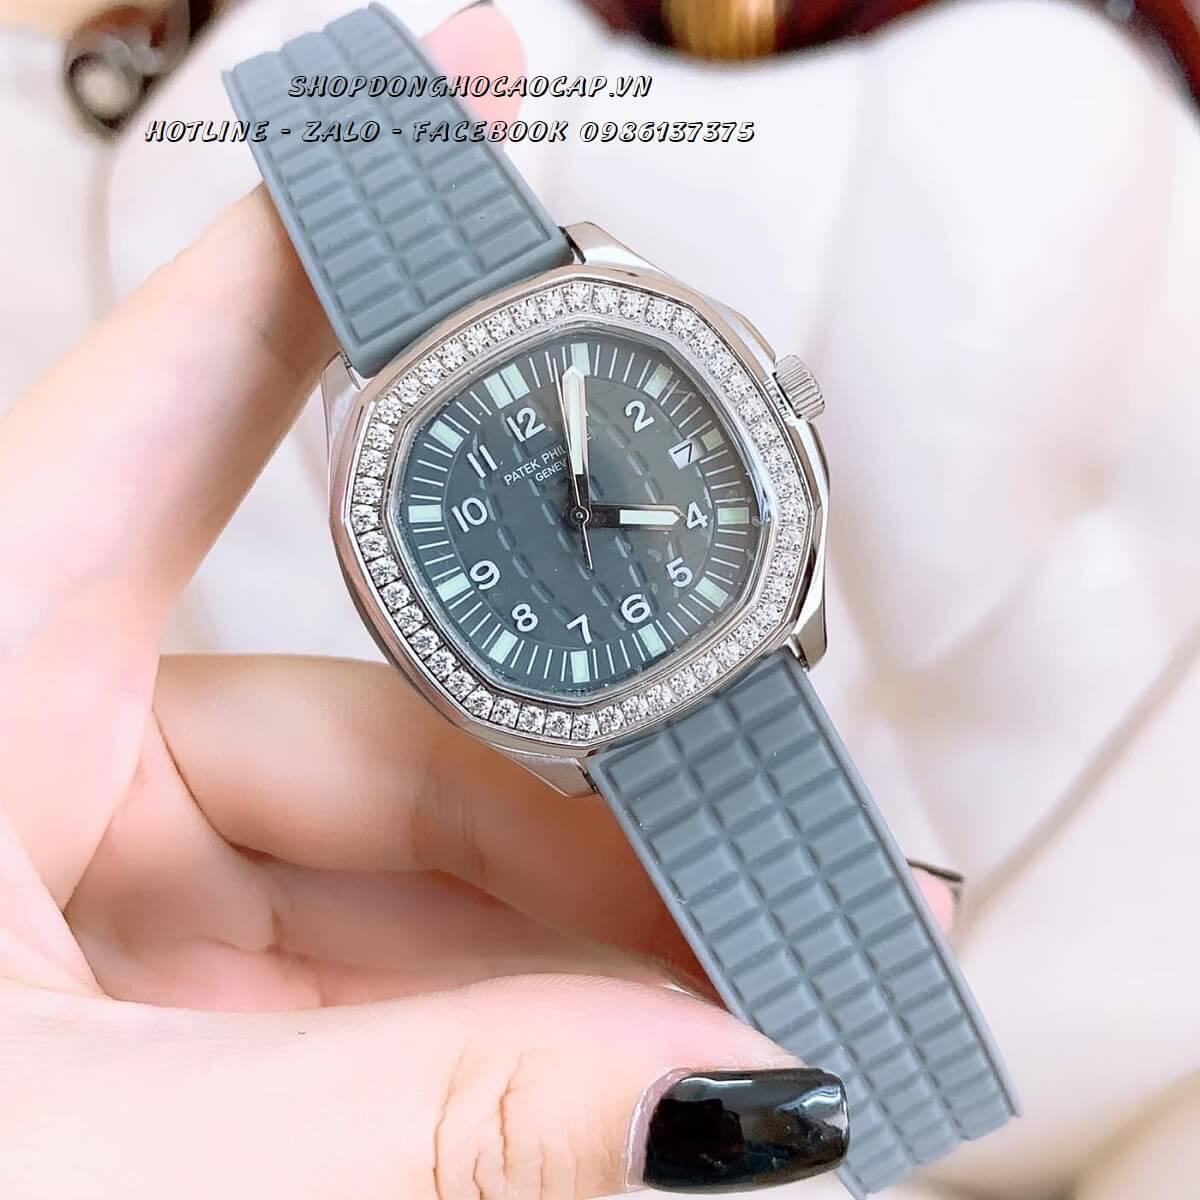 Đồng Hồ Patek Philippe Nữ Dây Silicon Xám Silver 35mm